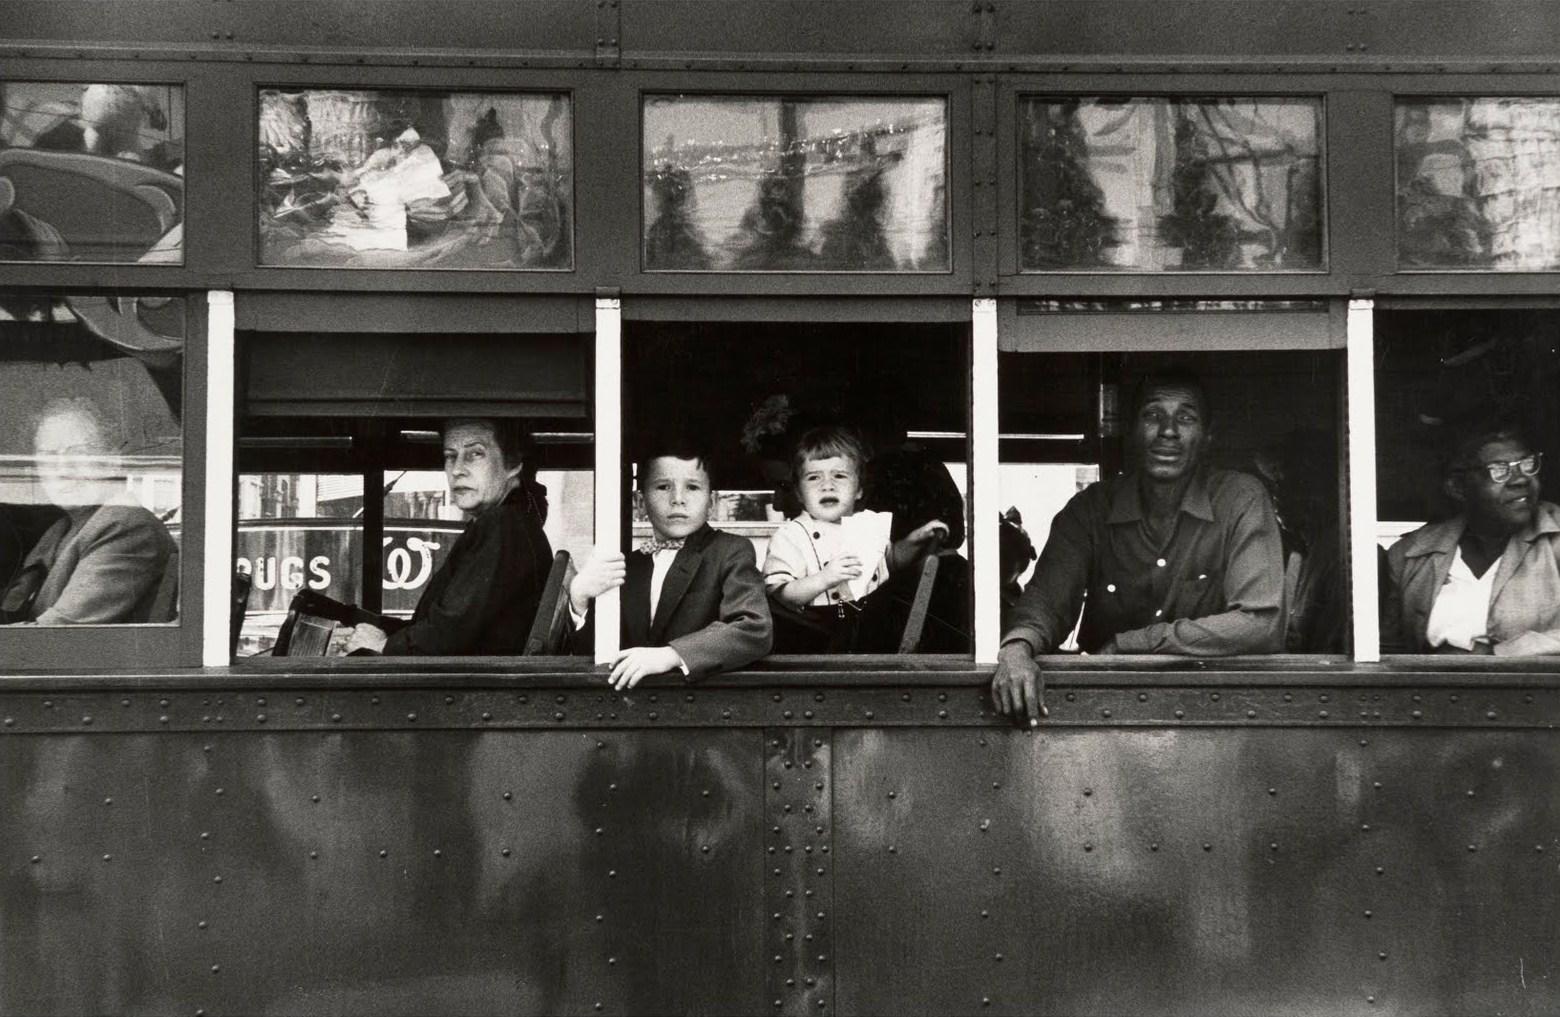 Robert Frank: Trolley - New Orleans, 1955